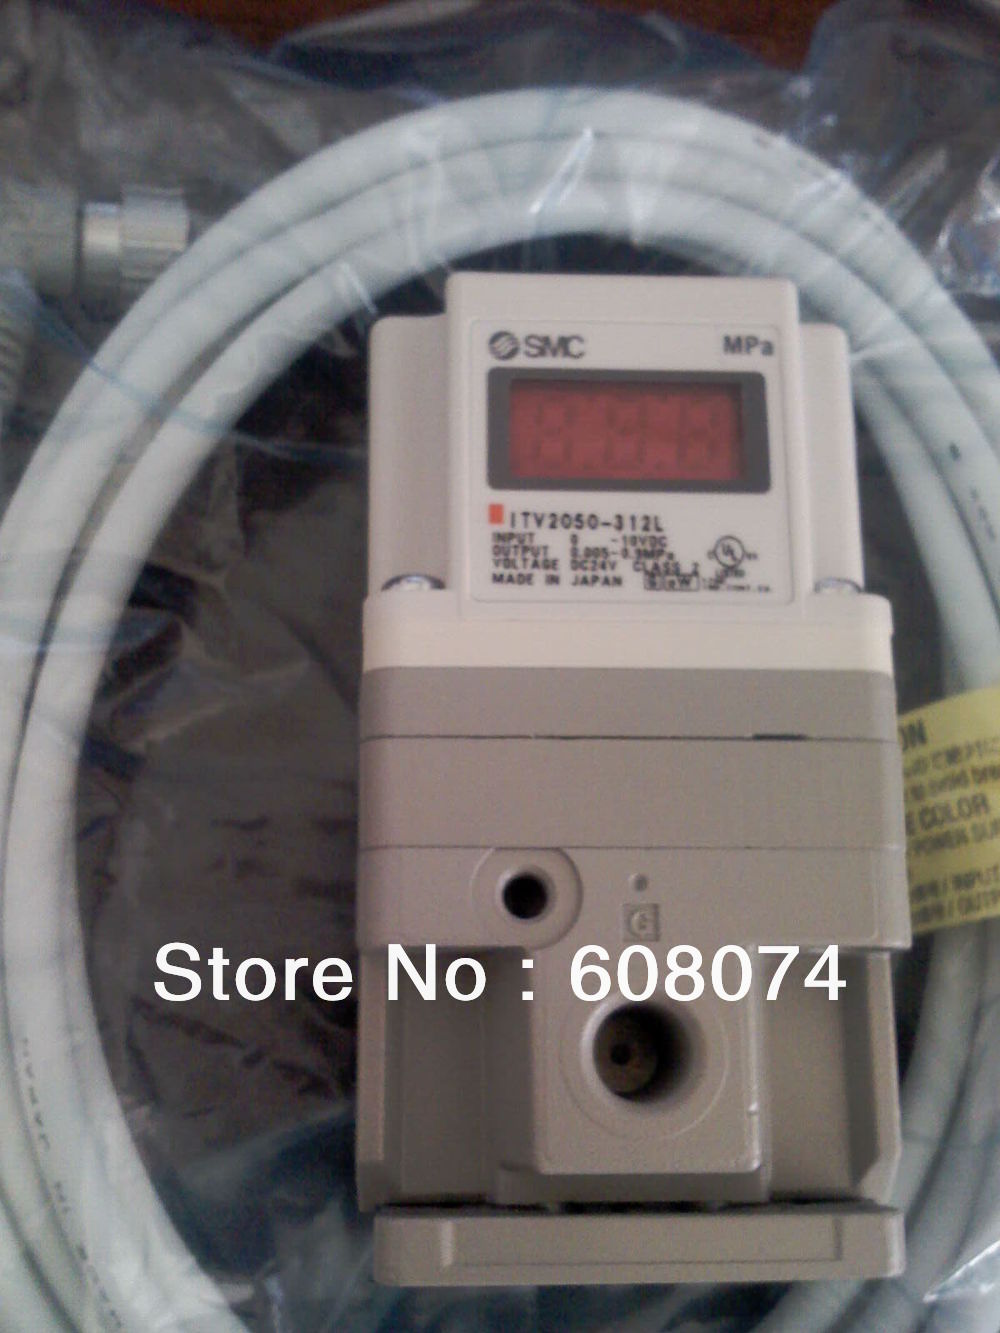 ELECTRO PNEUMATIC REGULATOR ITV2030-312L3 , 24VDC 1/4 PORT 0.005~0.5MPa 0~10V itv2030 312l electro pneumatic regulator 24vdc 1 4 port 0 10v input